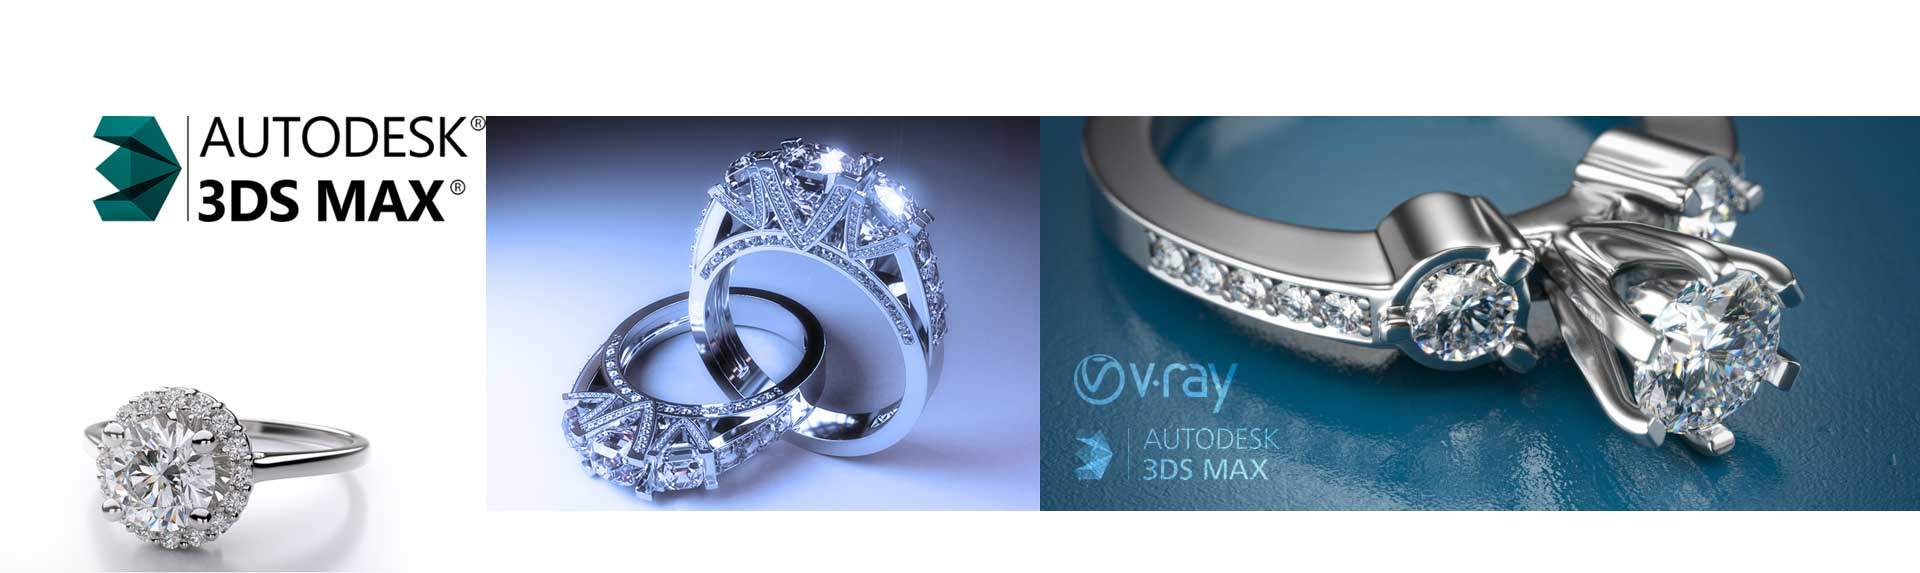 3dmaxطراحی جواهرات